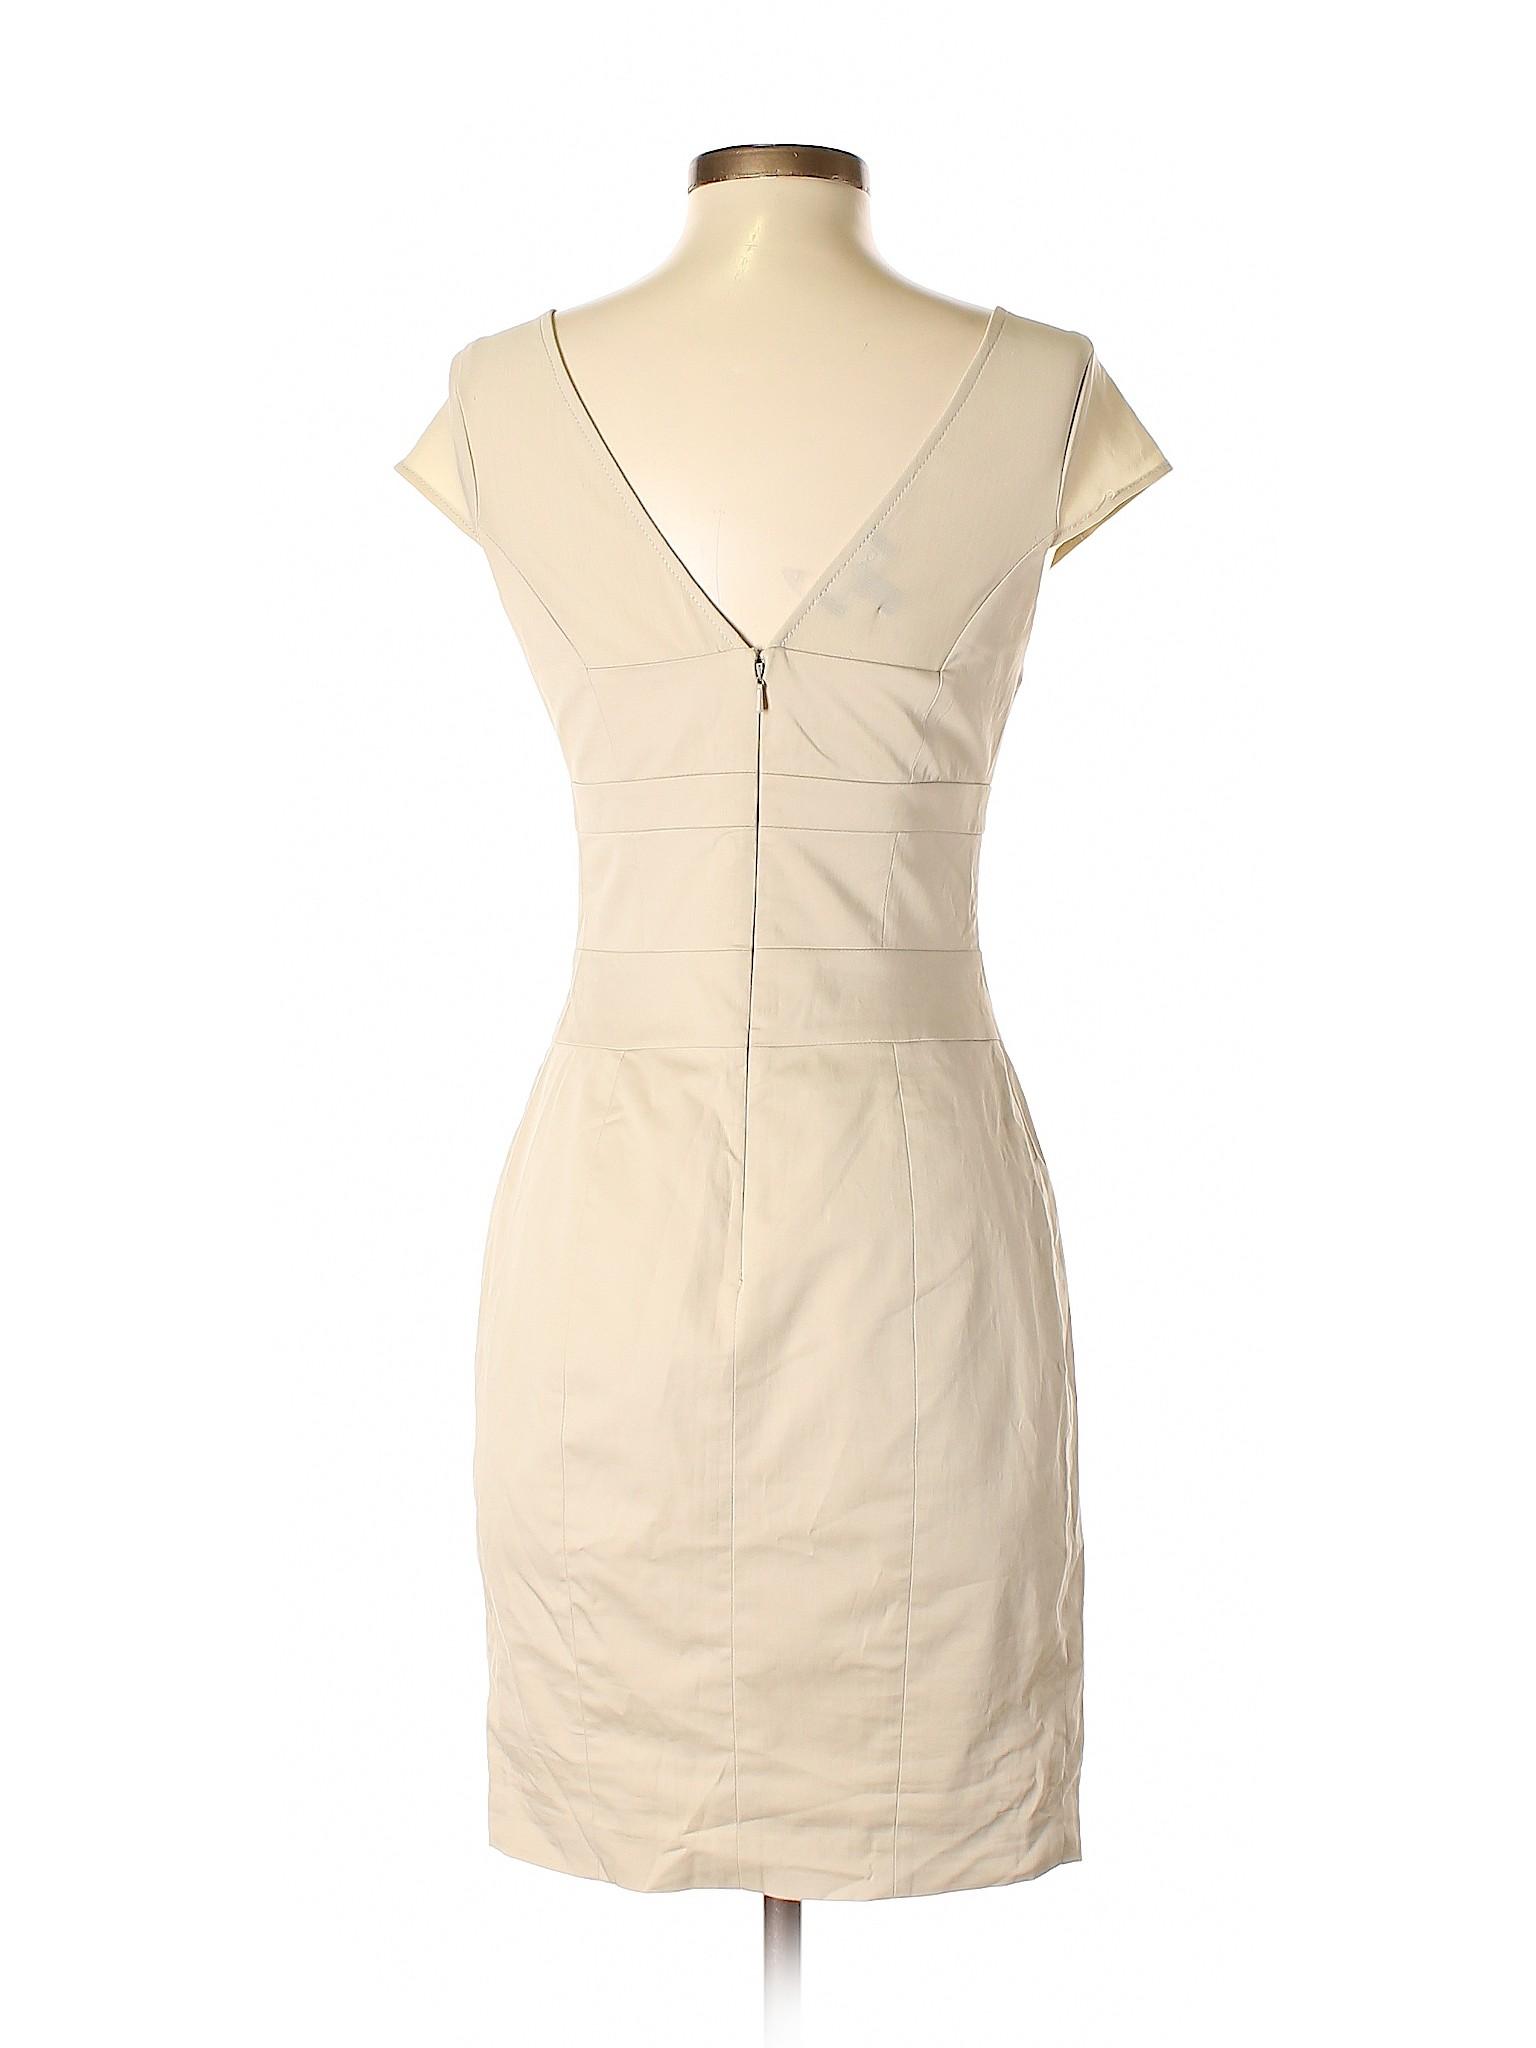 Boutique Bebe winter Bebe Casual winter Boutique Dress Dress Casual nAxYB